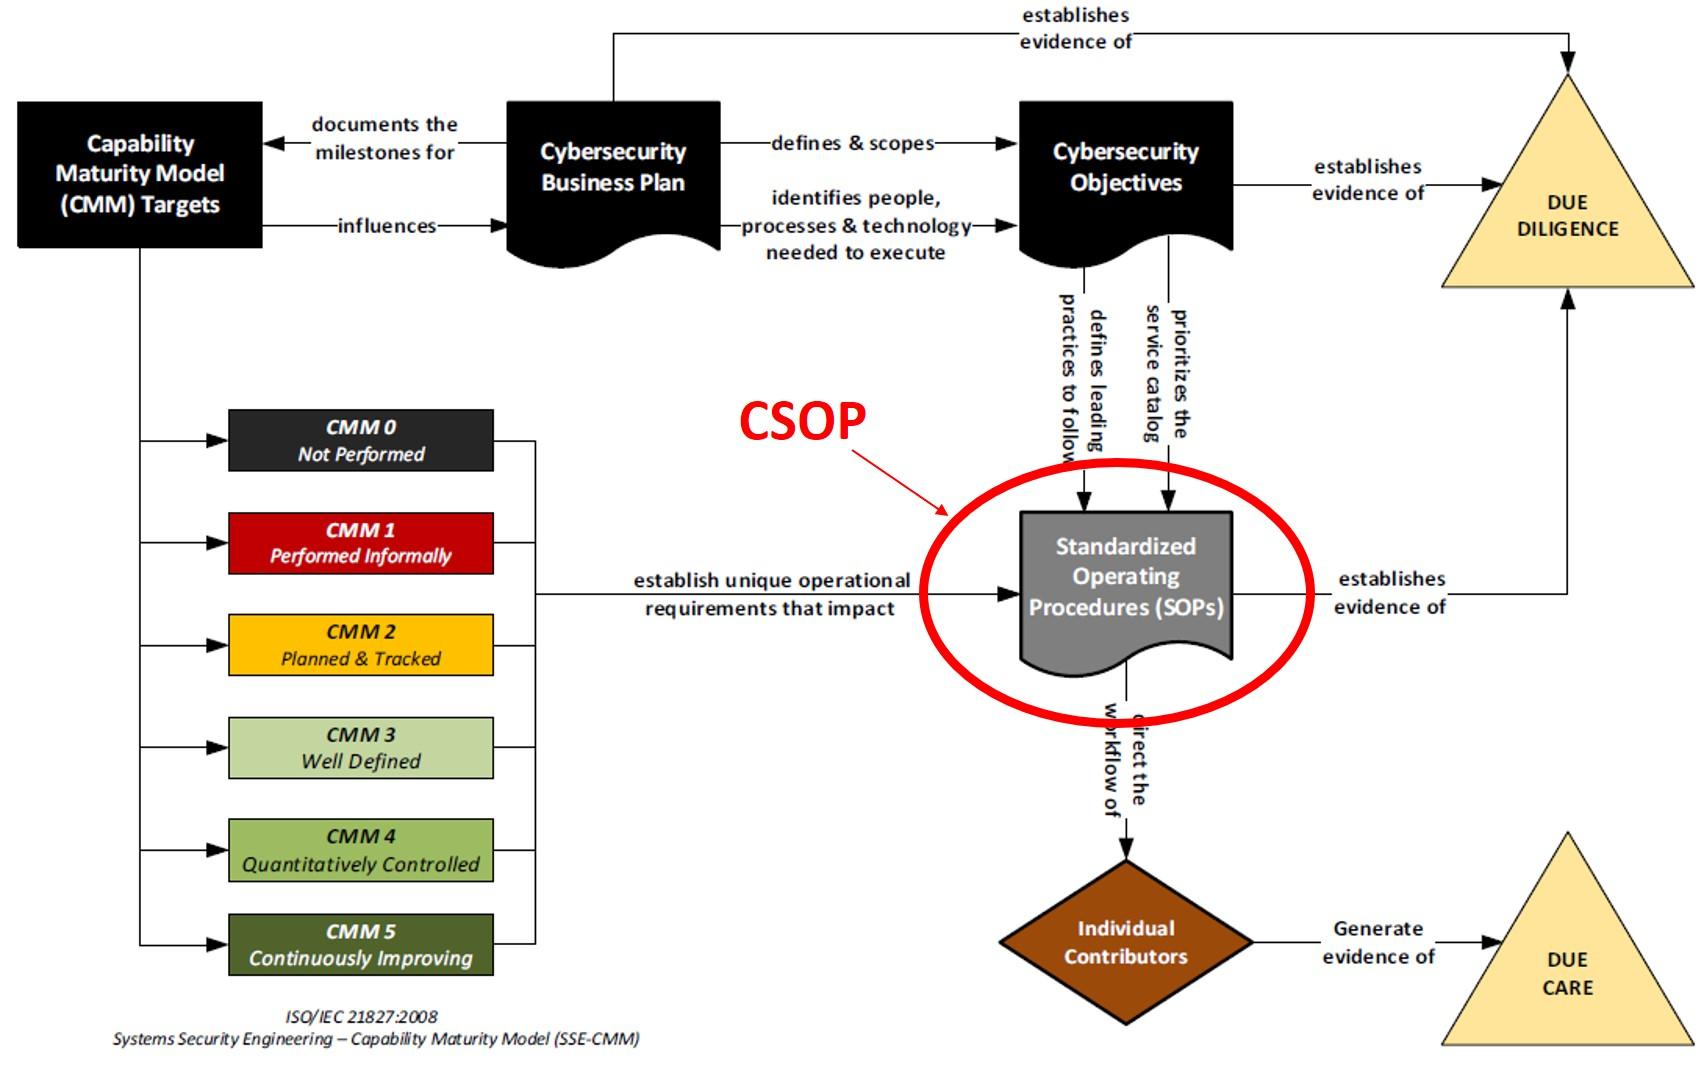 2020-operationalizing-cybersecurity-planning-model.jpg